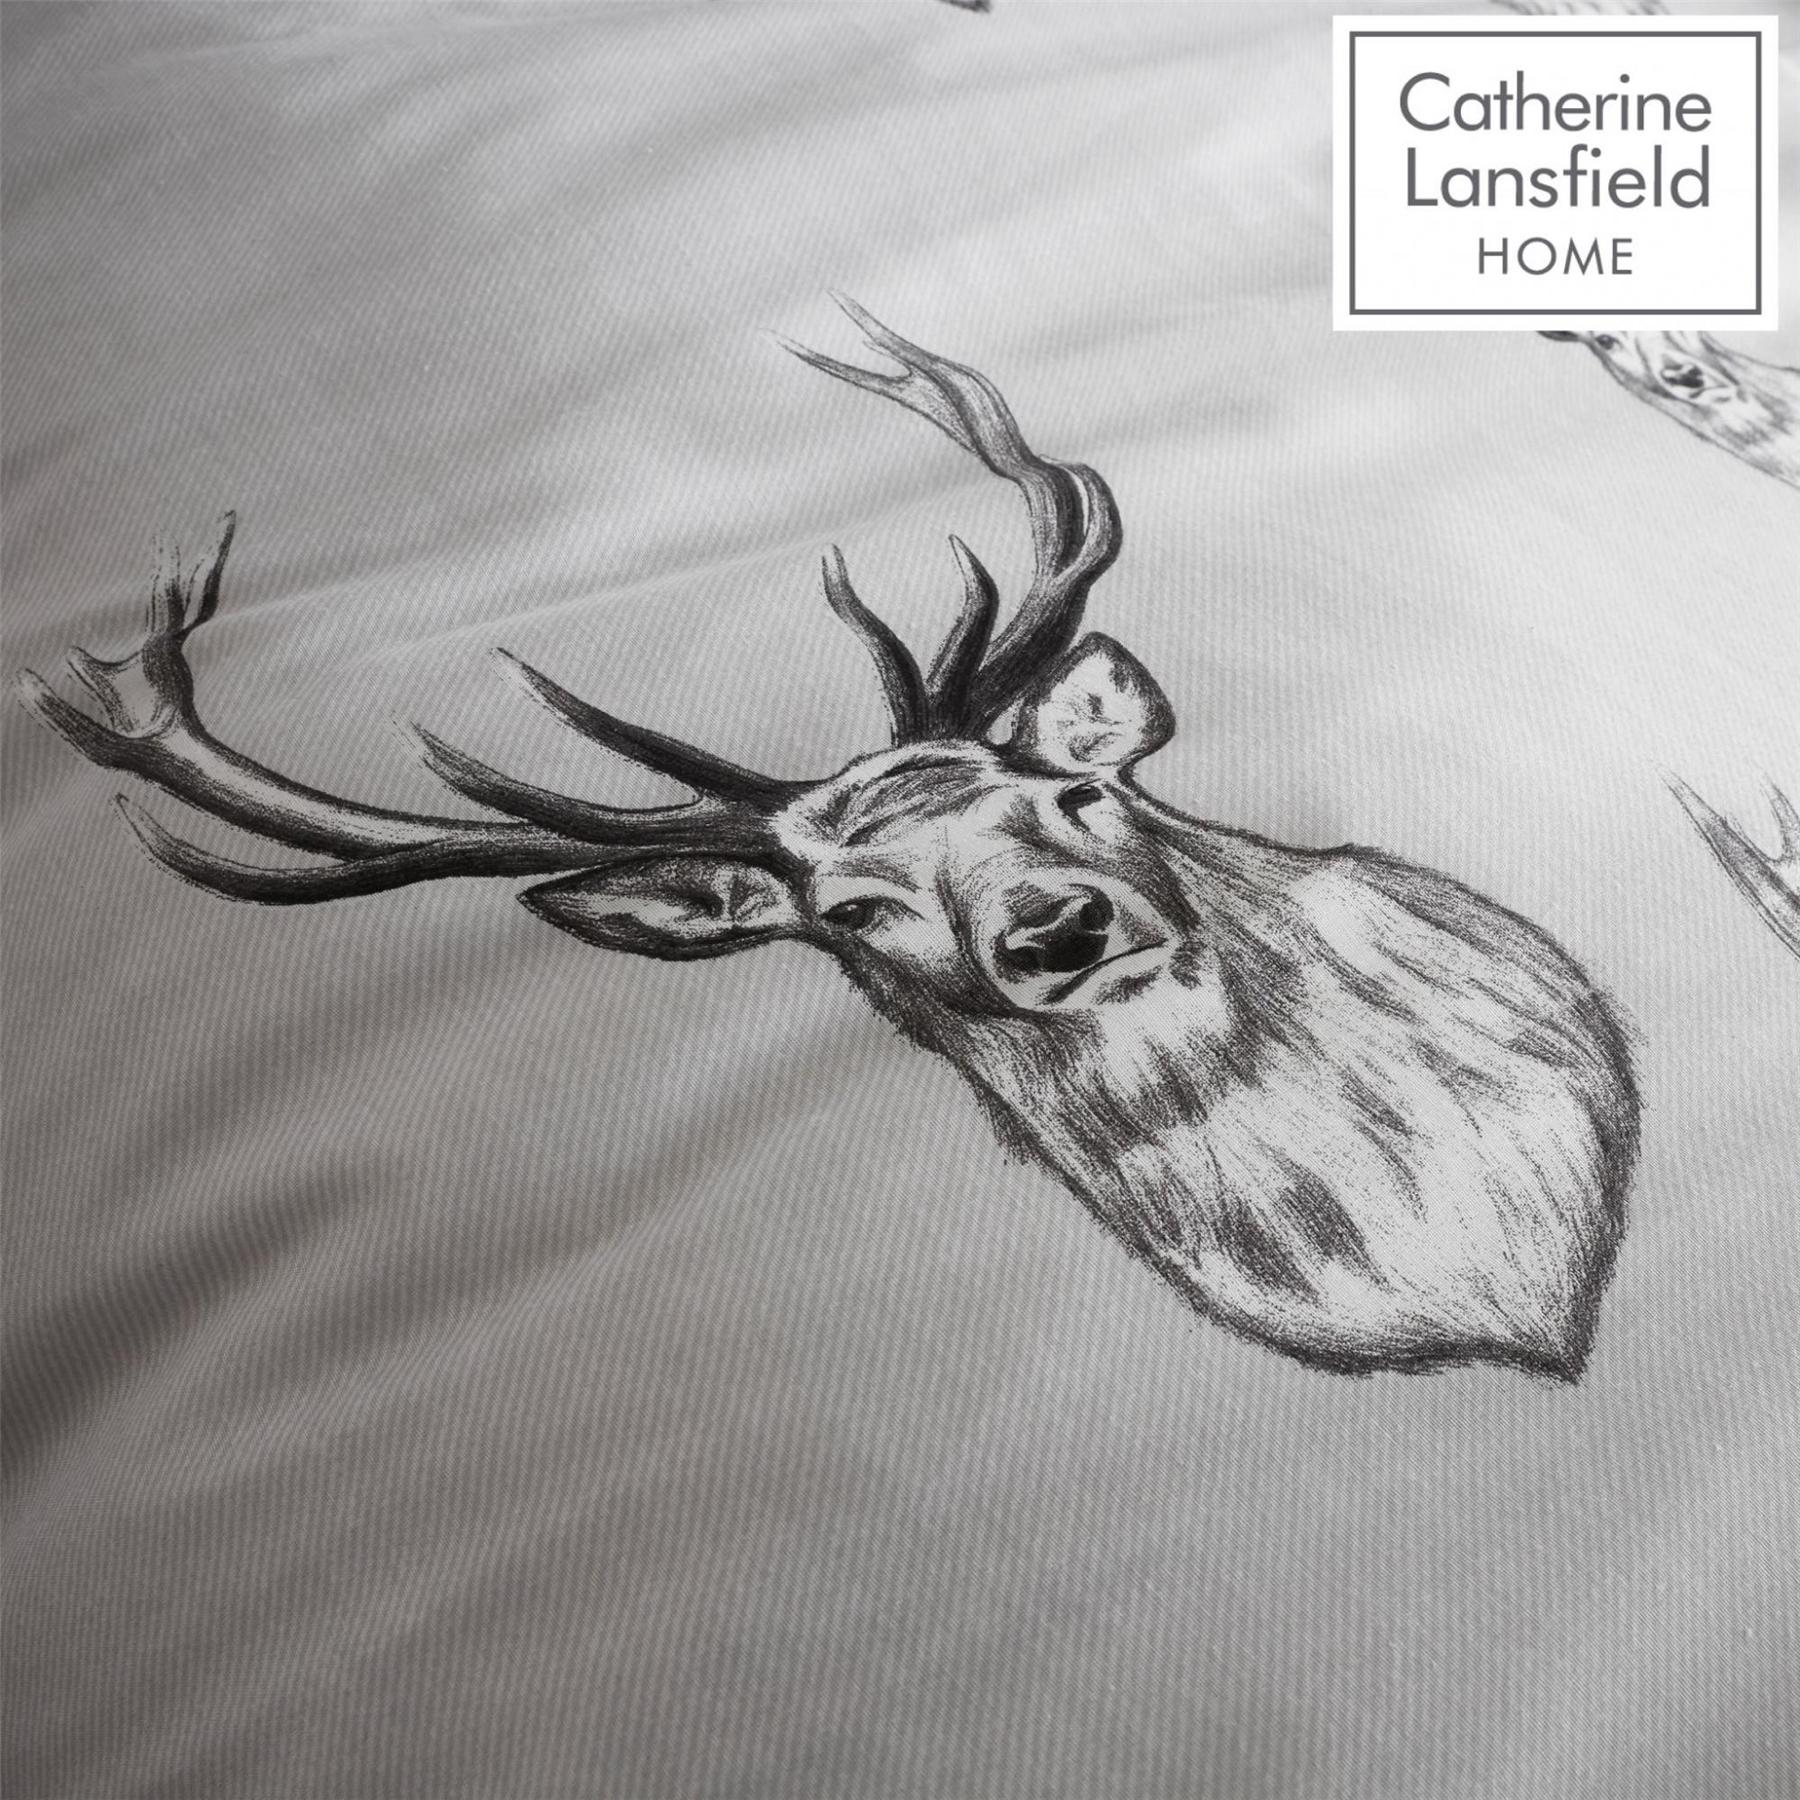 Catherine-Lansfield-Duvet-Set-Highland-Stag-Reversible-Check-Bedding-Grey thumbnail 8